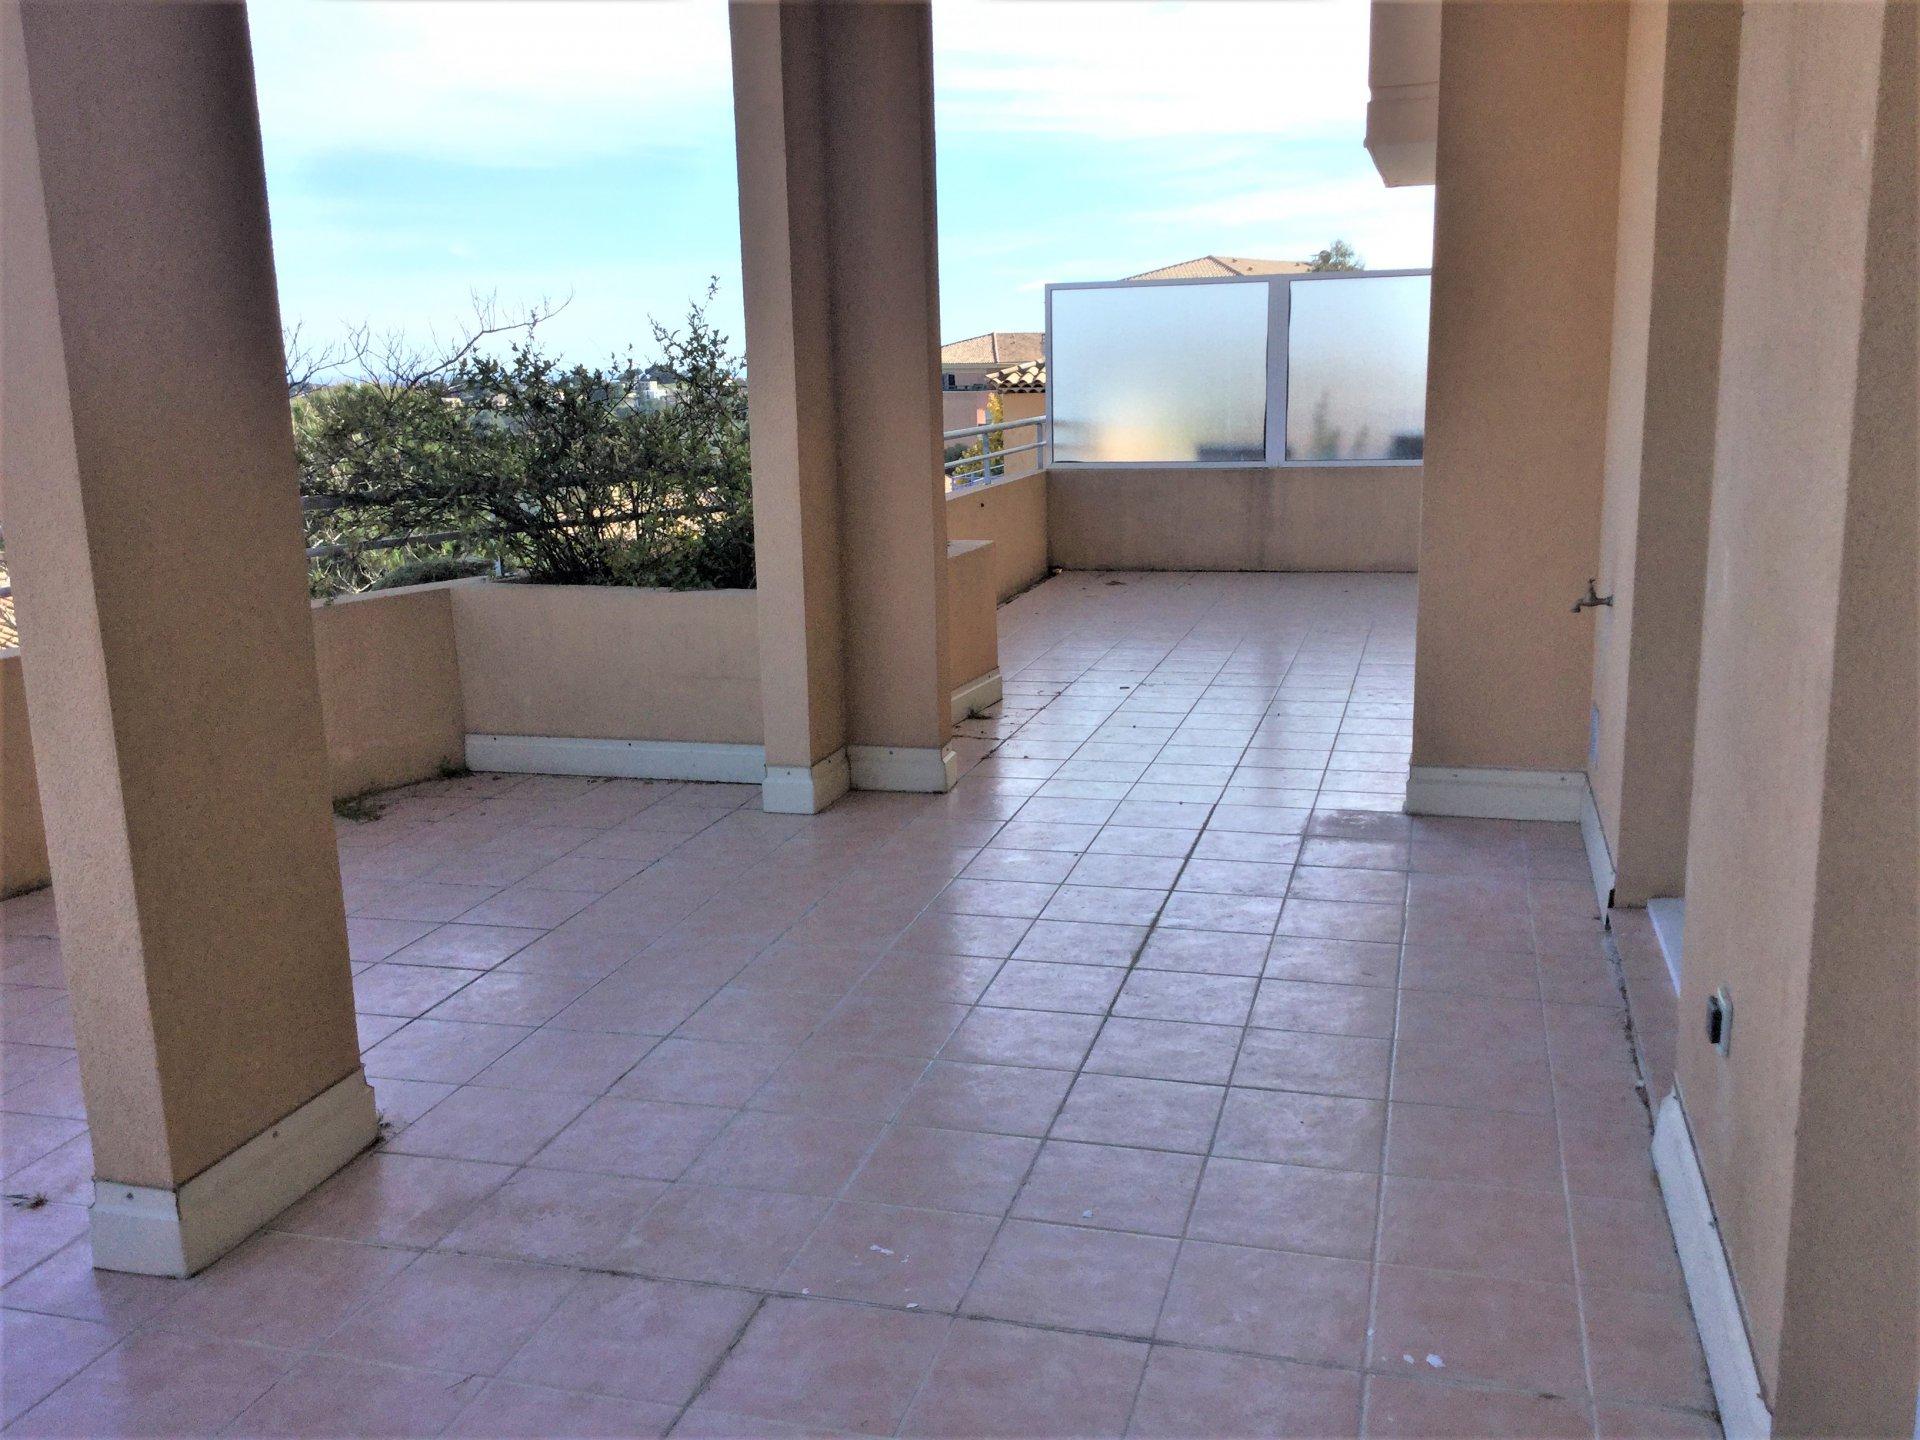 BIOT St. Philippe - Appartement 3 pièces  66 m²- vue mer panoramique